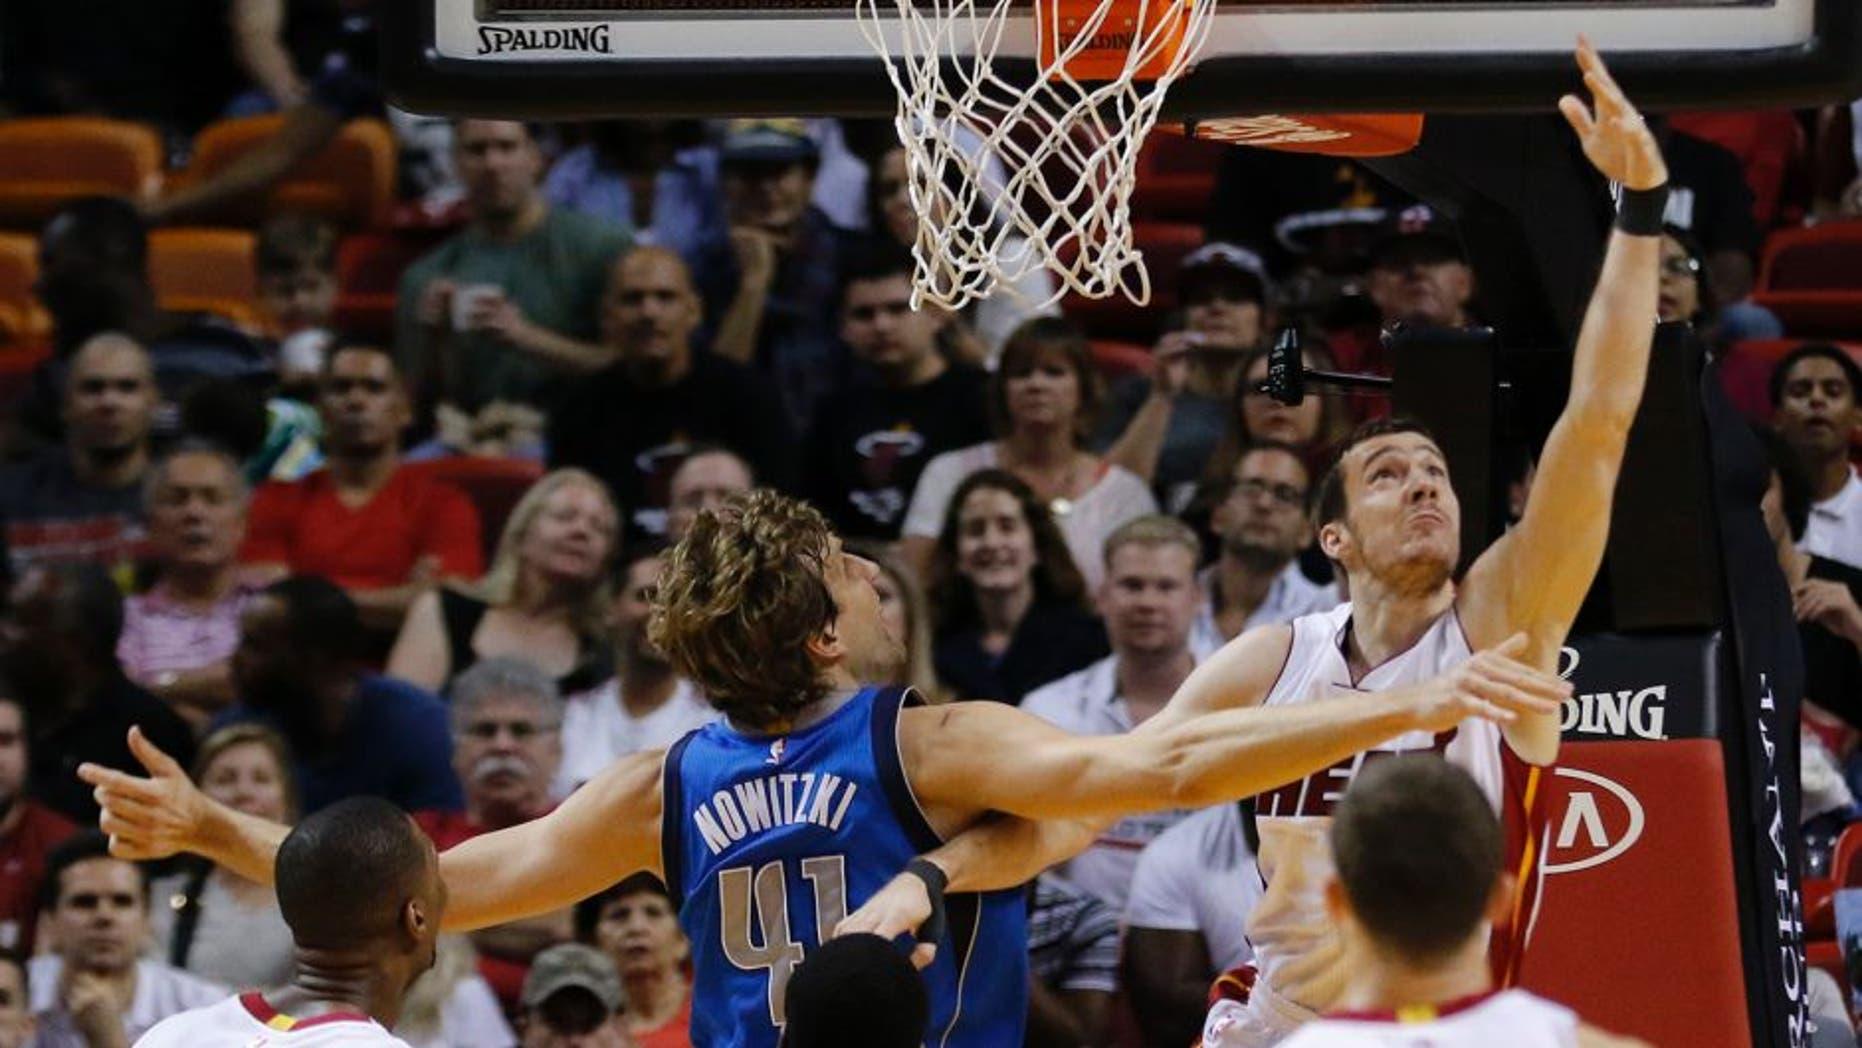 Miami Heat guard Goran Dragic (7) shoots as Dallas Mavericks forward Dirk Nowitzki (41) defends during the first half of an NBA basketball game, Friday, Jan. 1, 2016, in Miami. (AP Photo/Joe Skipper)